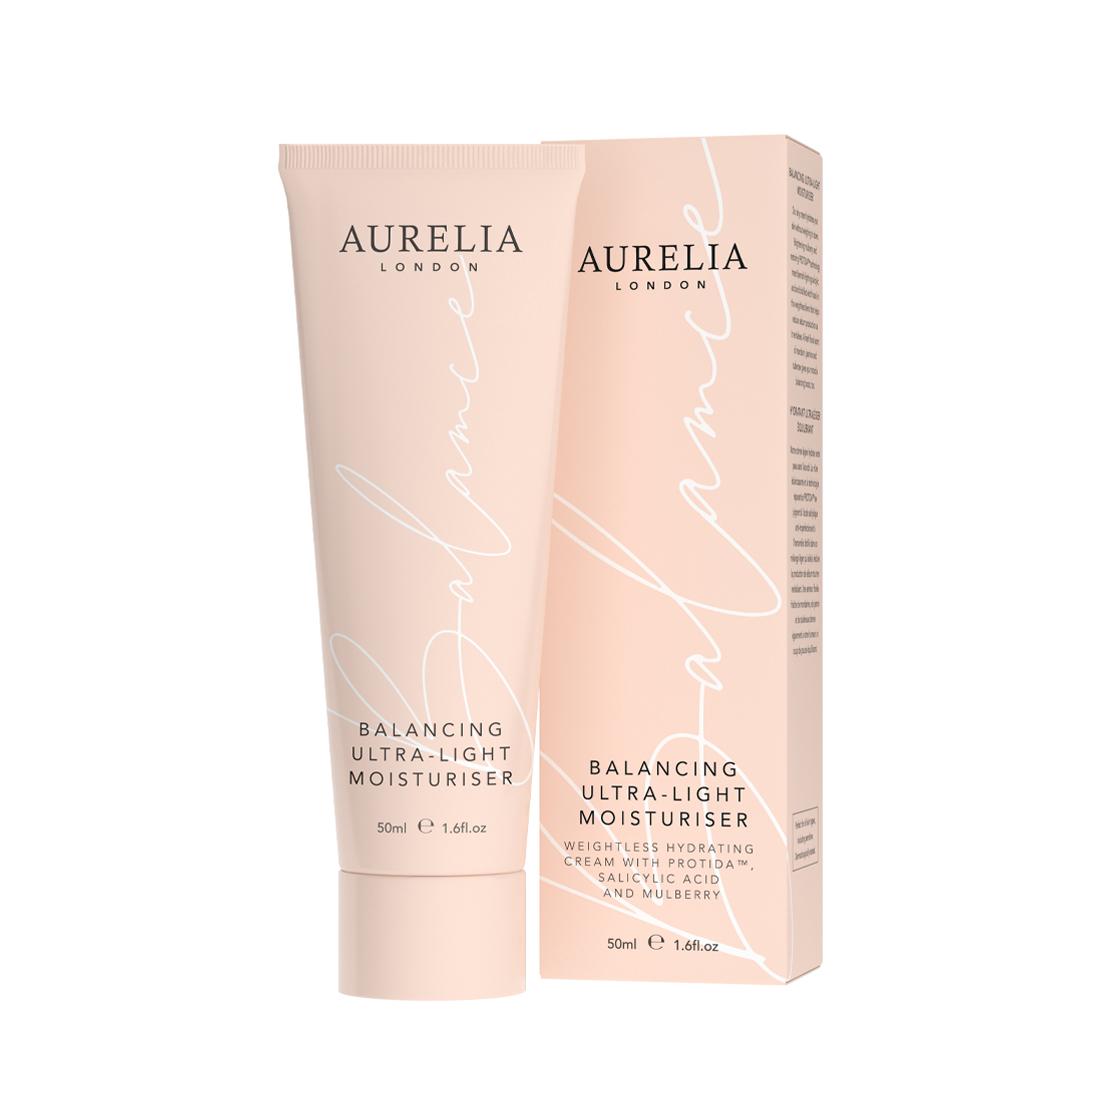 An image of Balancing Ultra-Light Moisturiser 50ml Aurelia London, Probiotic moisturiser for...